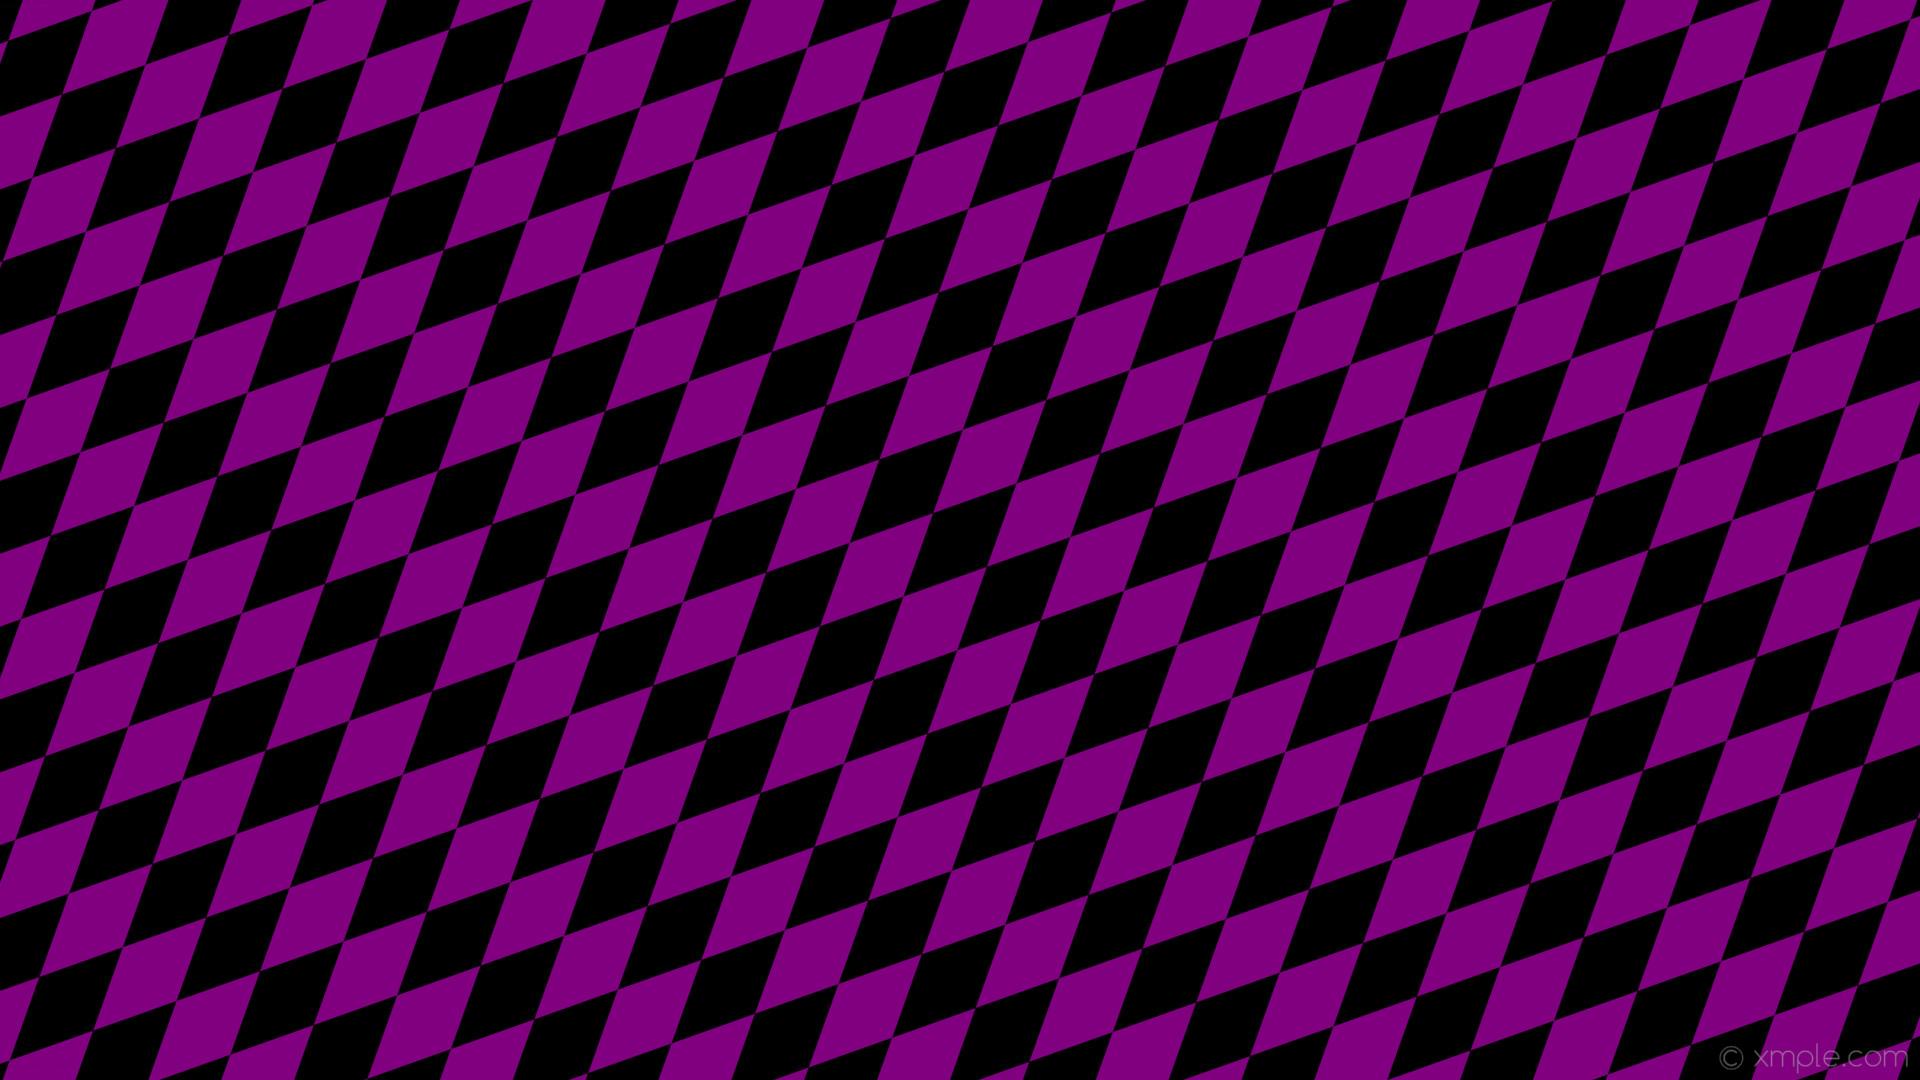 wallpaper rhombus black lozenge diamond purple #000000 #800080 45° 160px  76px